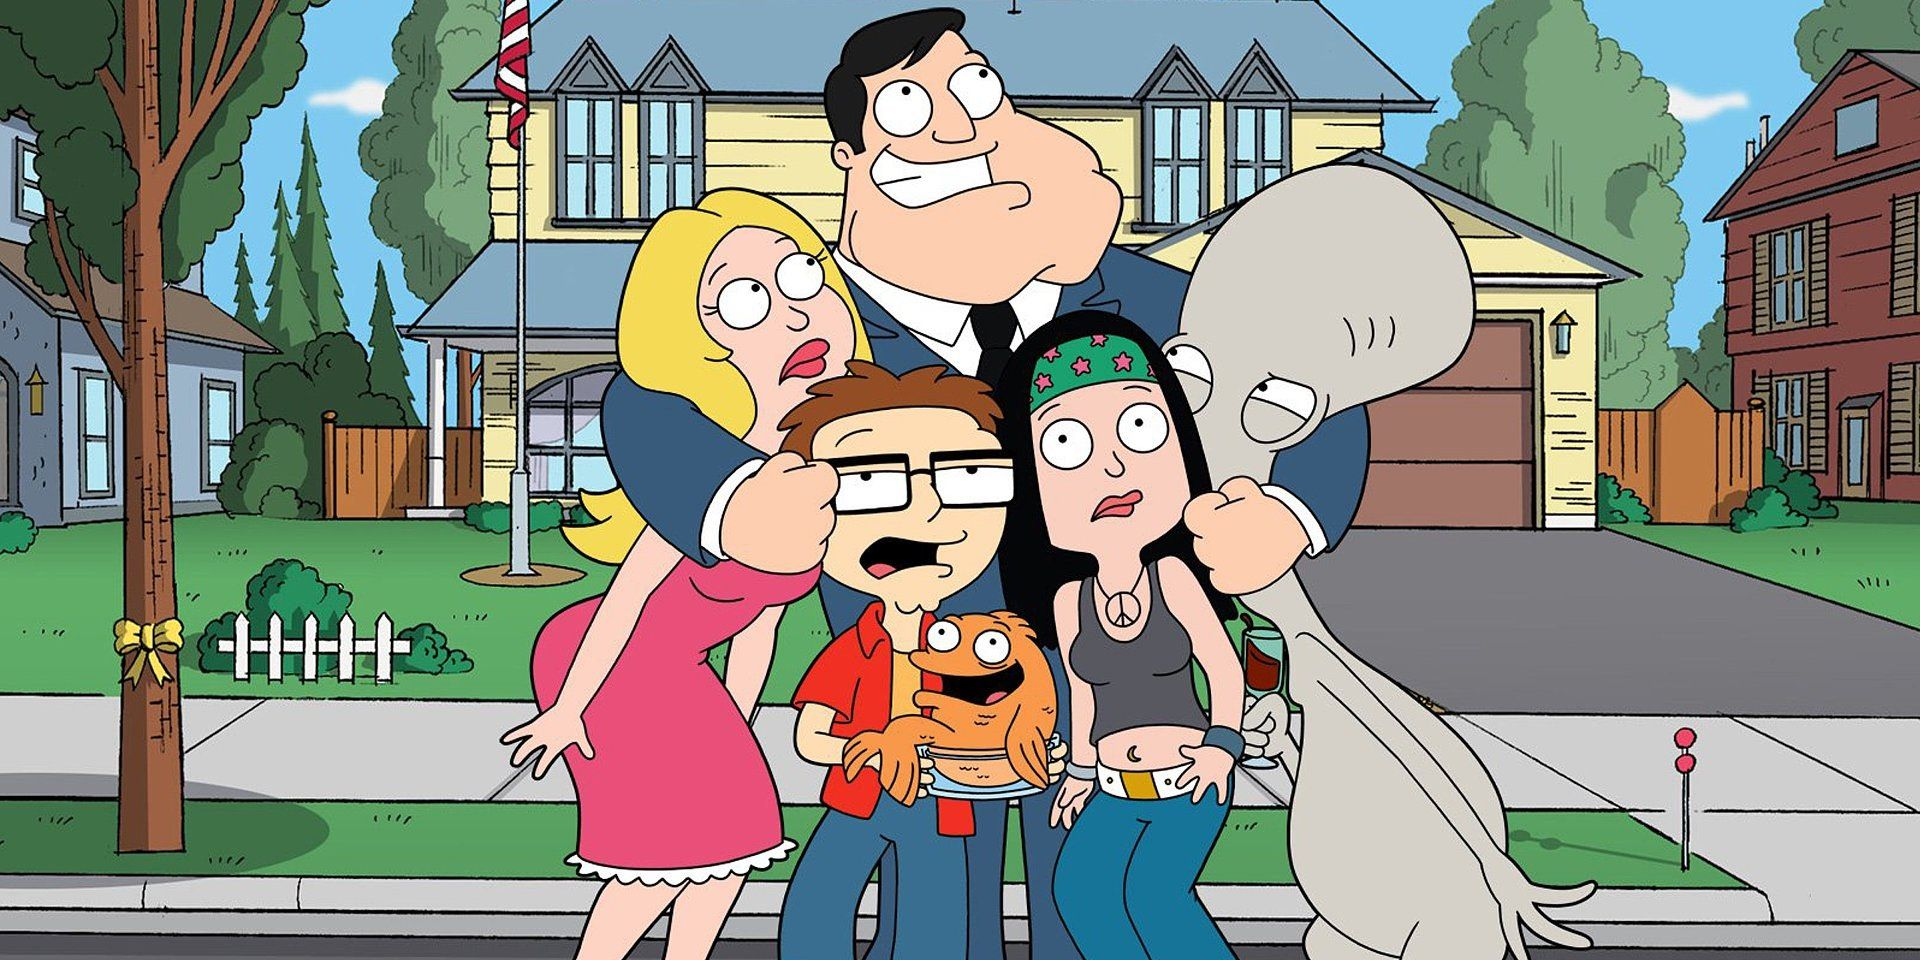 American Dad american dad renewed for season 18 & 19, 300th episode airs